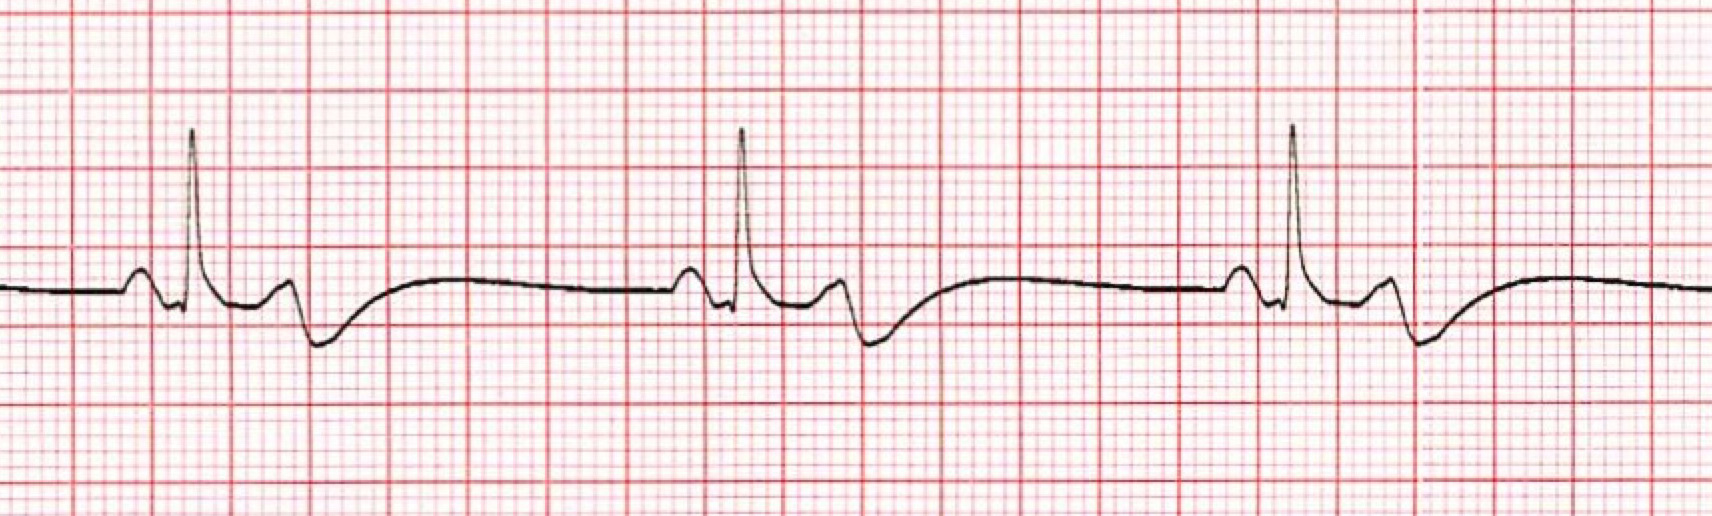 Bradycardia ECG/EKG